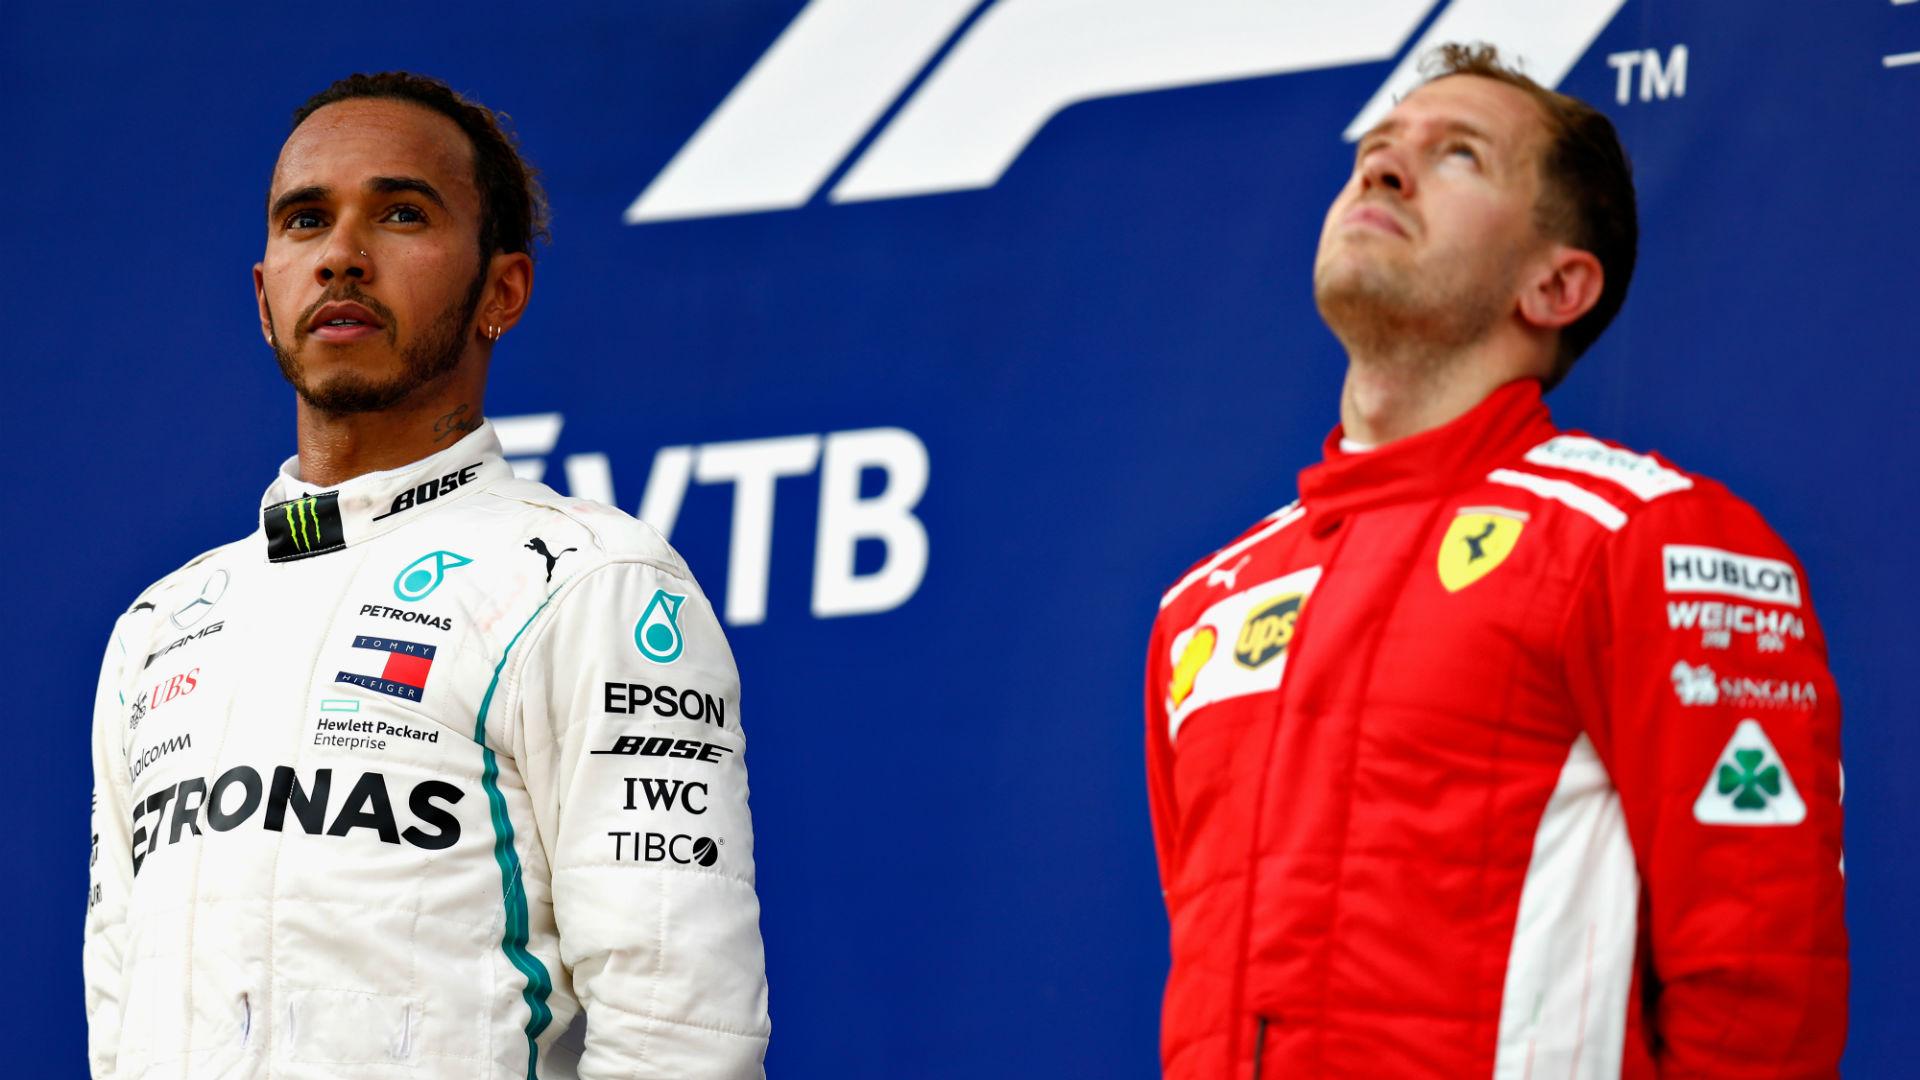 Hamilton believes Ferrari cracked under pressure as he claimed pole